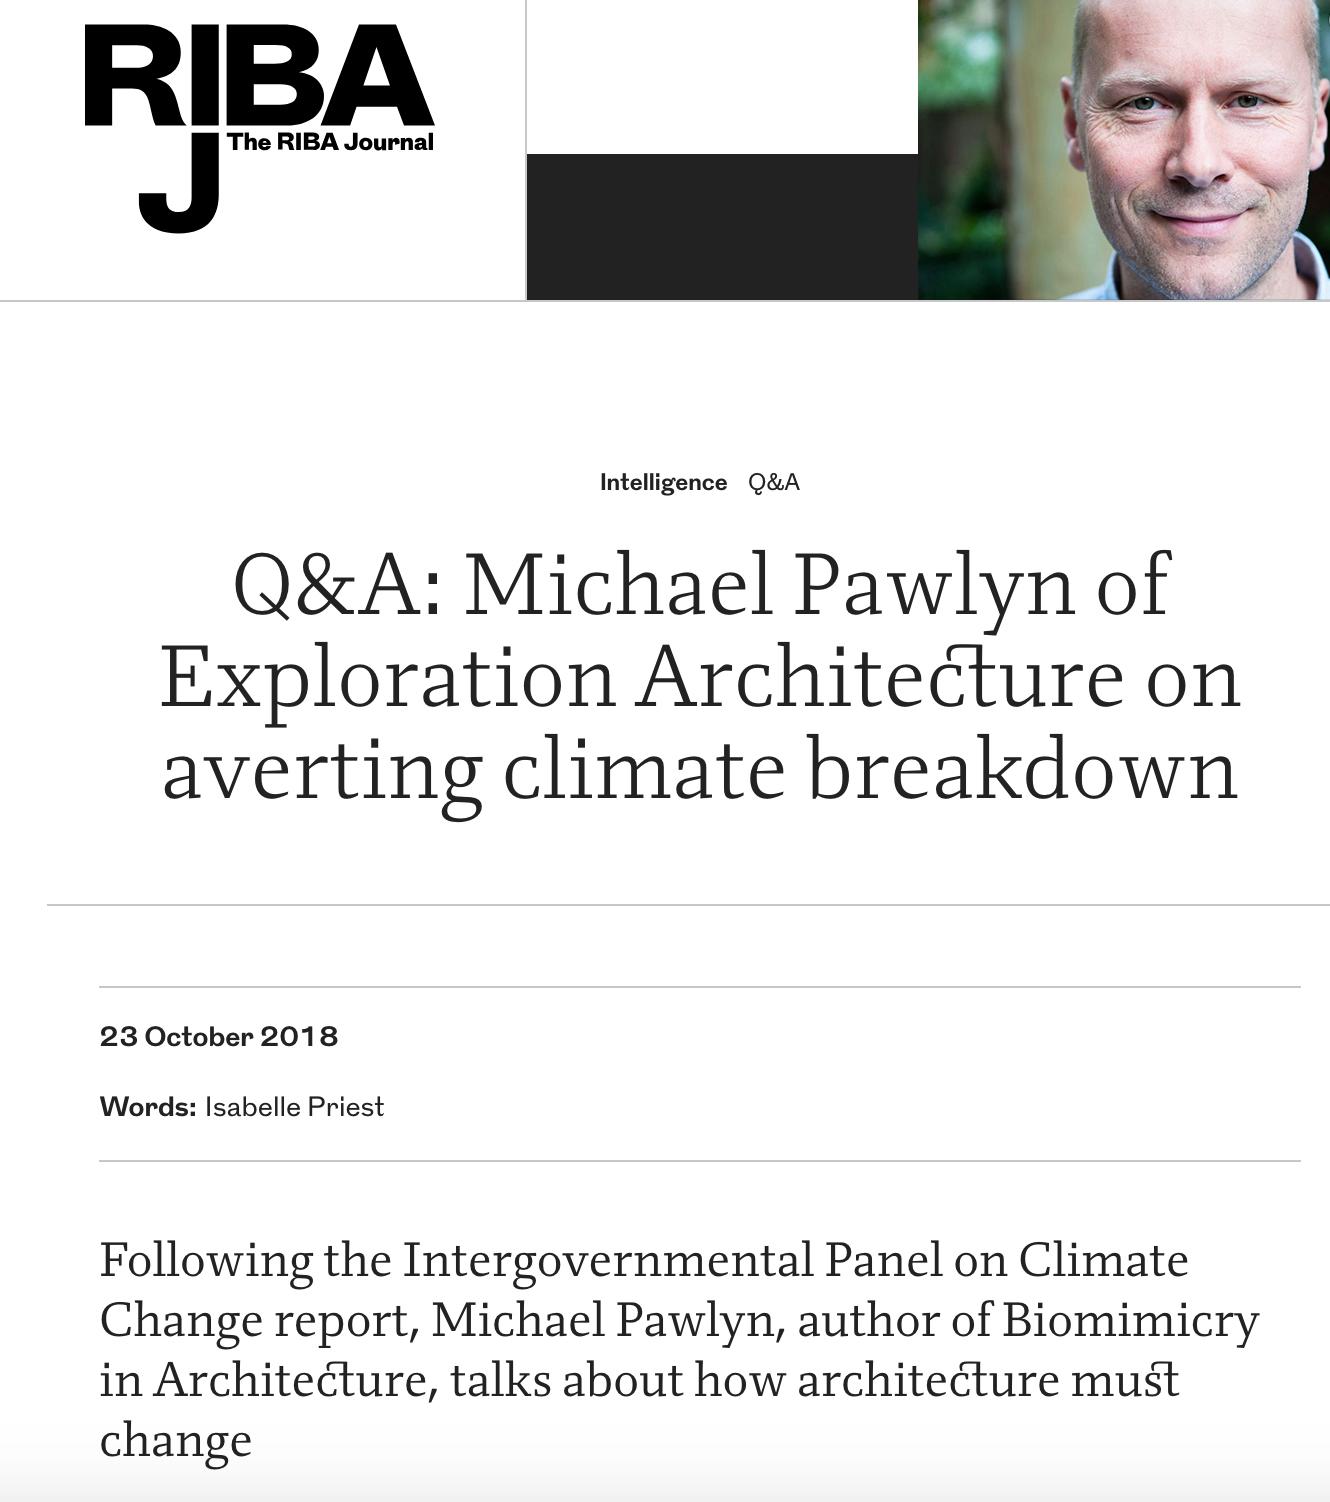 The RIBA Journal : Q&A Michael Pawlyn